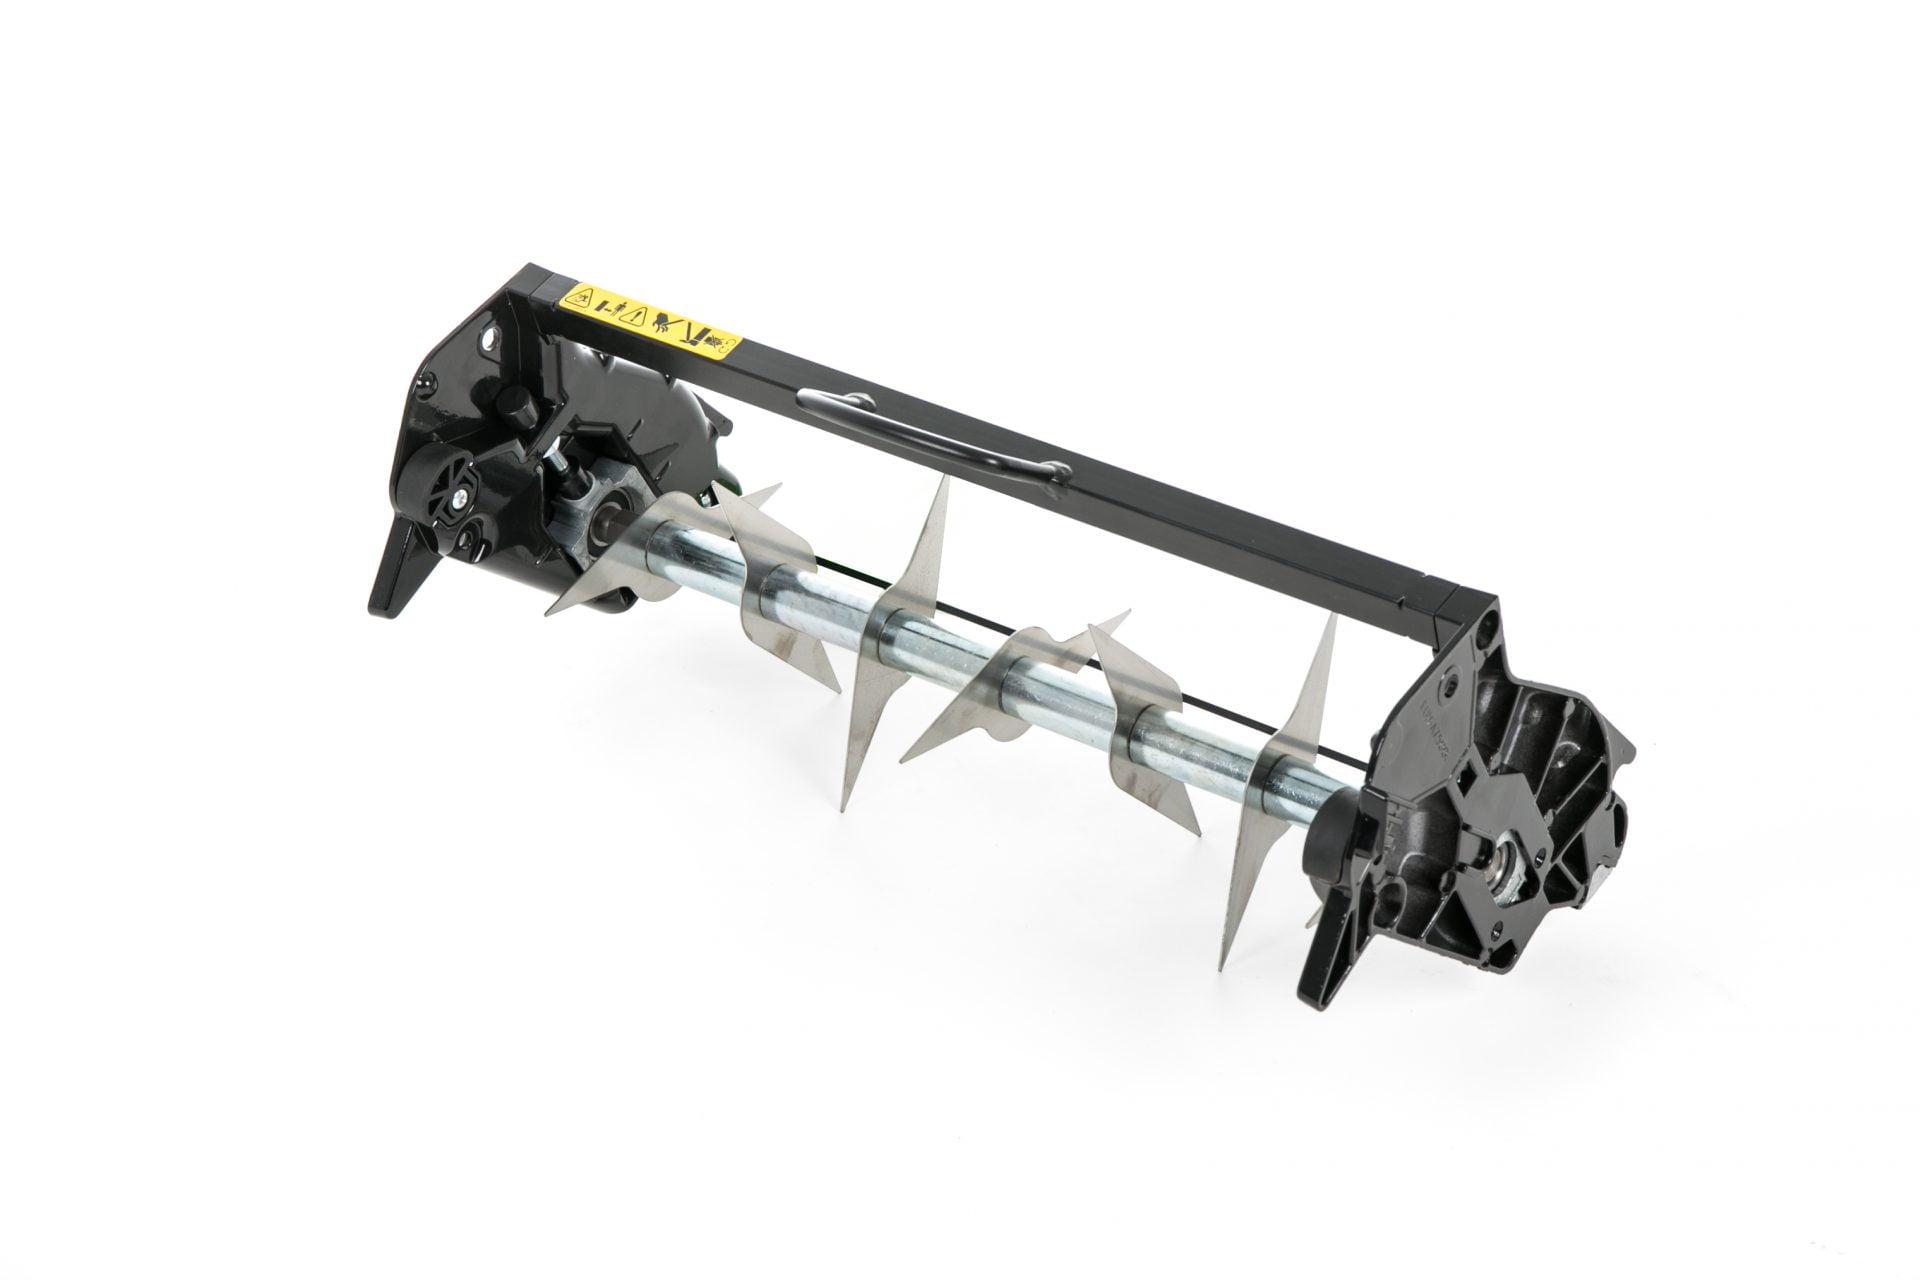 Allett 14 inch Aerator Quick Change Cartridge